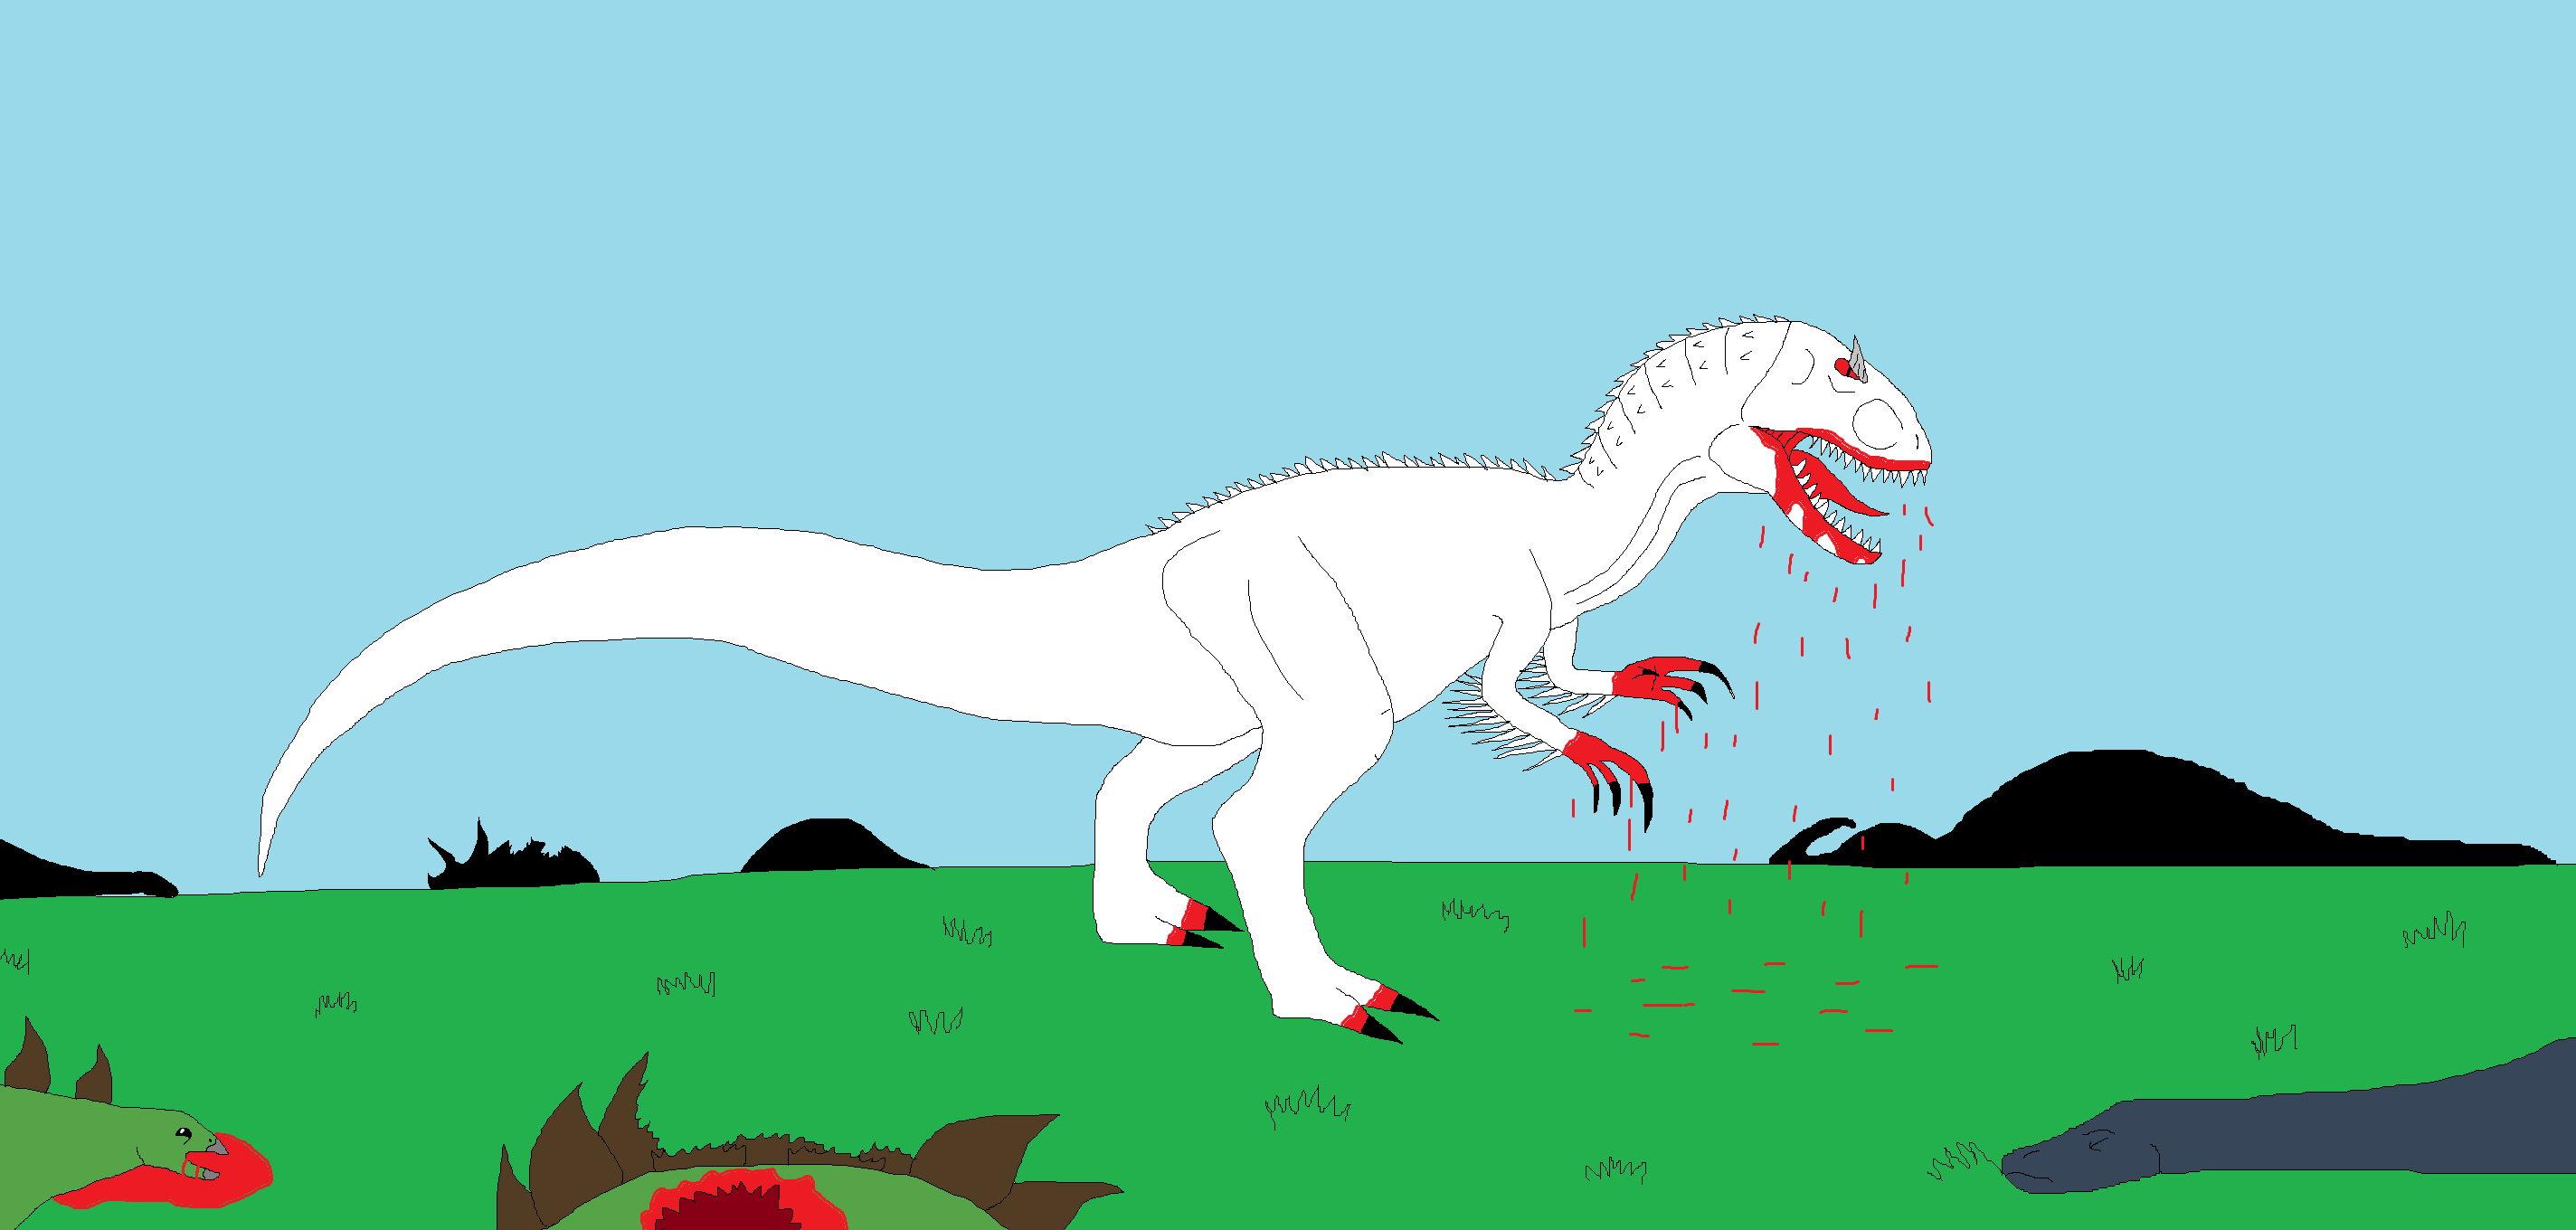 Hybrid Indominus Rex by Syfyman2XXX on DeviantArt